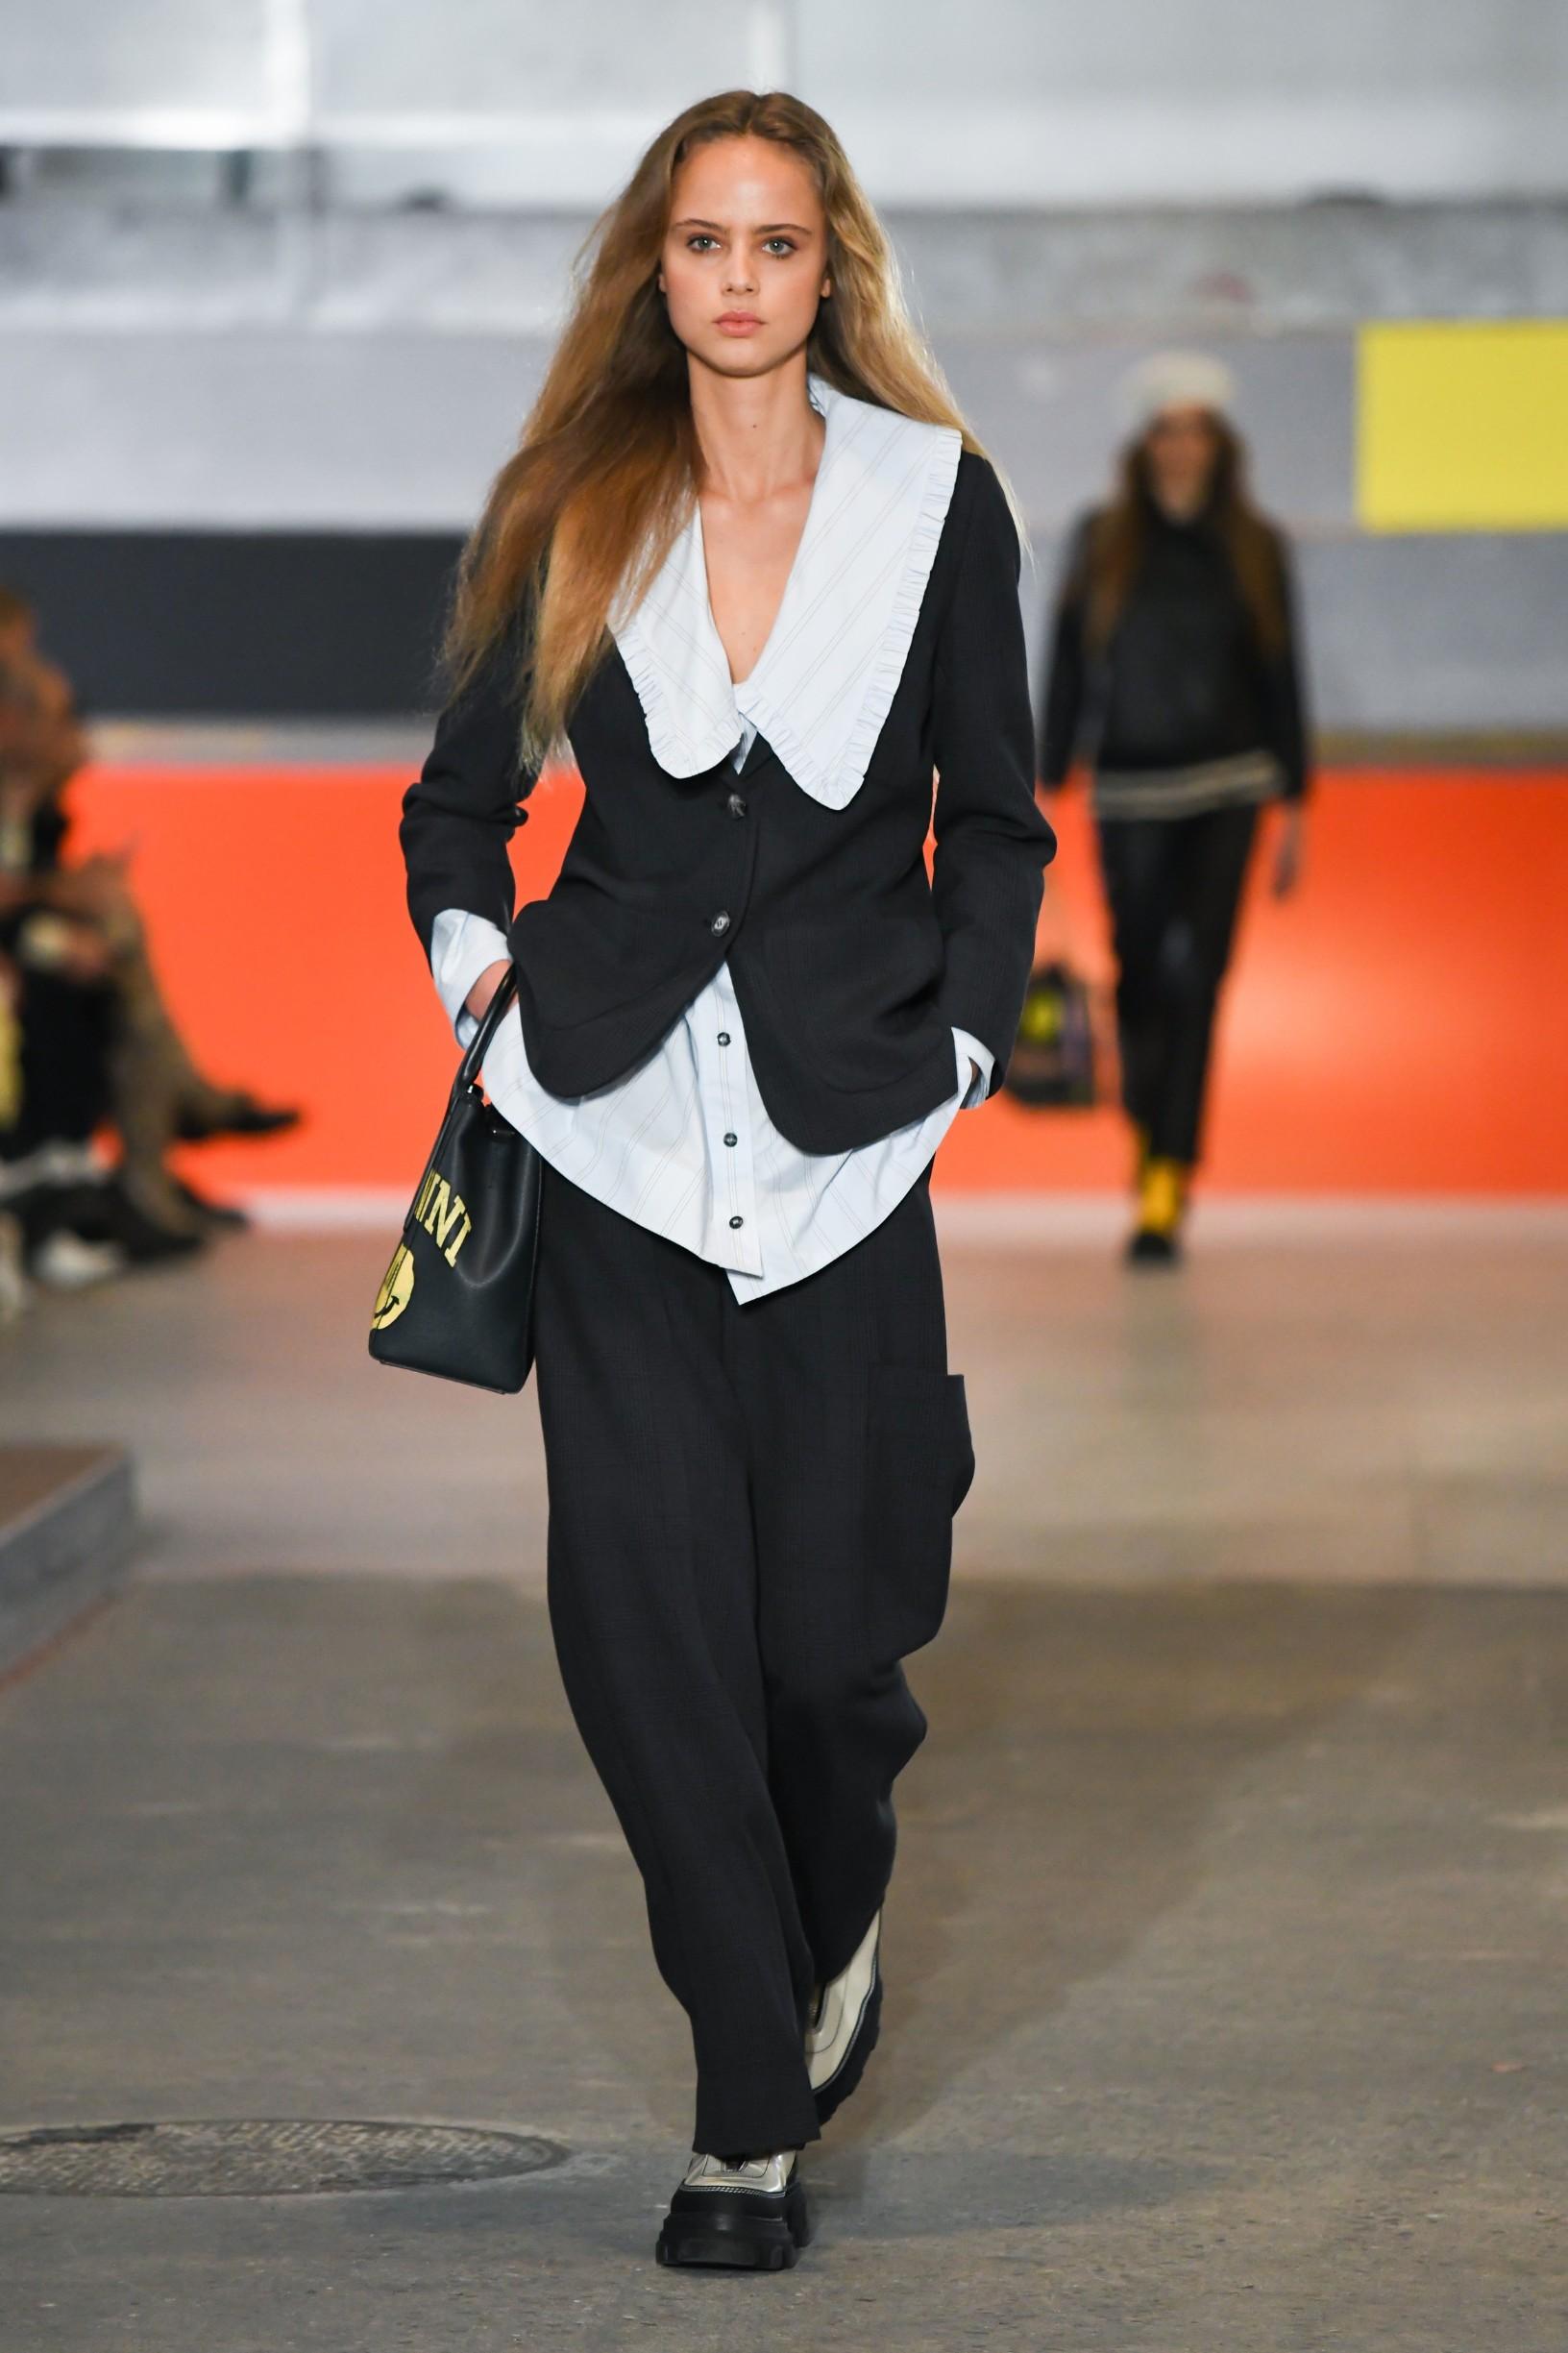 Model on the catwalk Ganni show, Runway, Fall Winter 2020, Copenhagen Fashion Week, Denmark - 30 Jan 2020,Image: 495661234, License: Rights-managed, Restrictions: , Model Release: no, Credit line: Cynthia Anderson / Shutterstock Editorial / Profimedia